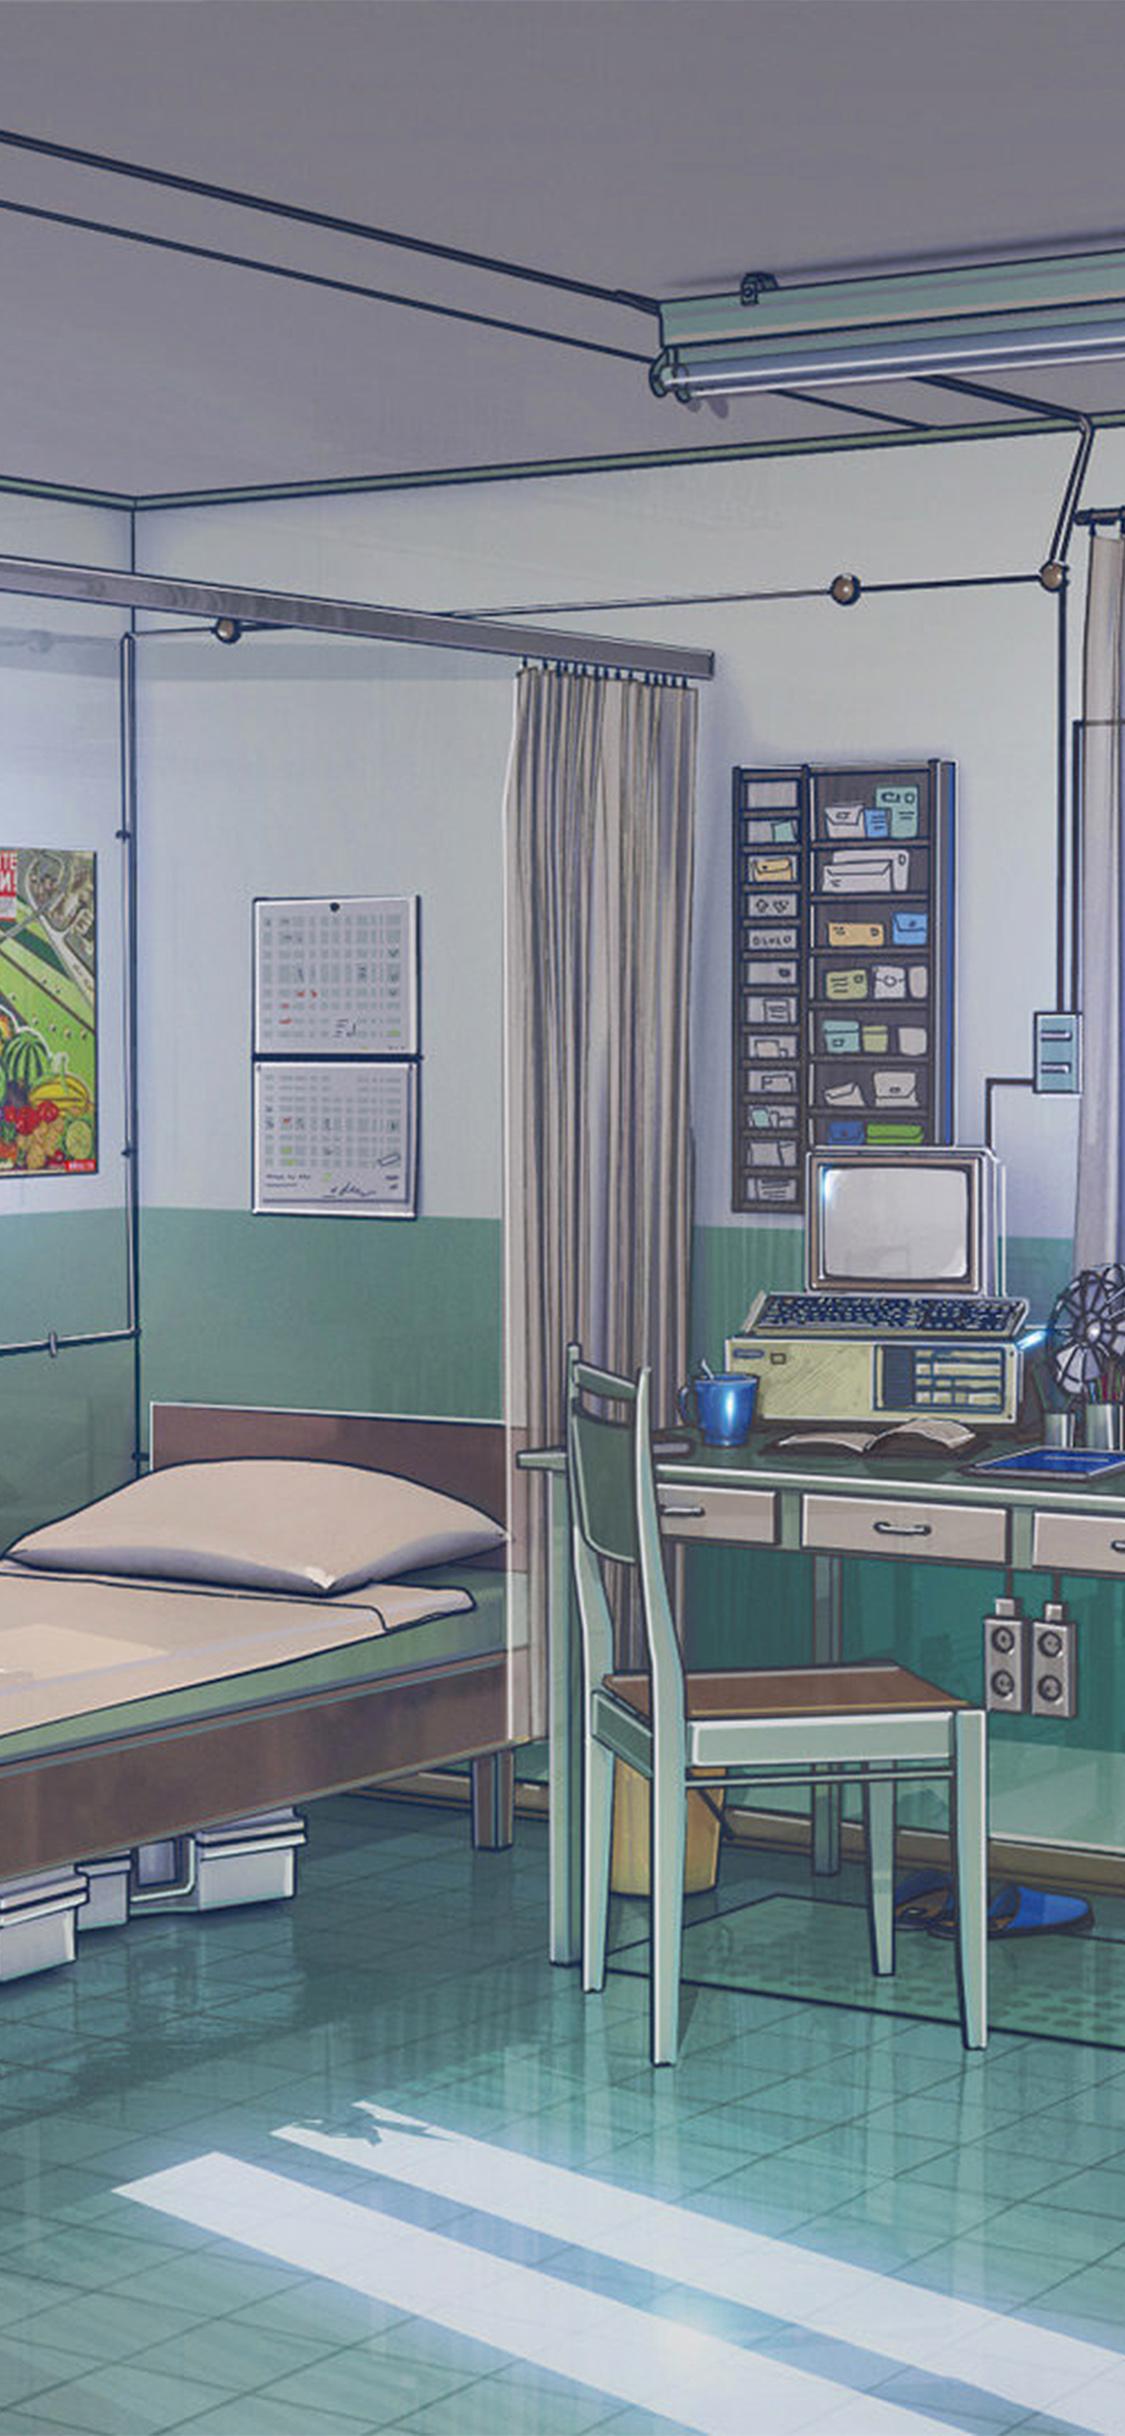 iPhoneXpapers.com-Apple-iPhone-wallpaper-aw92-anime-illustration-art-arseniy-chebynkin-office